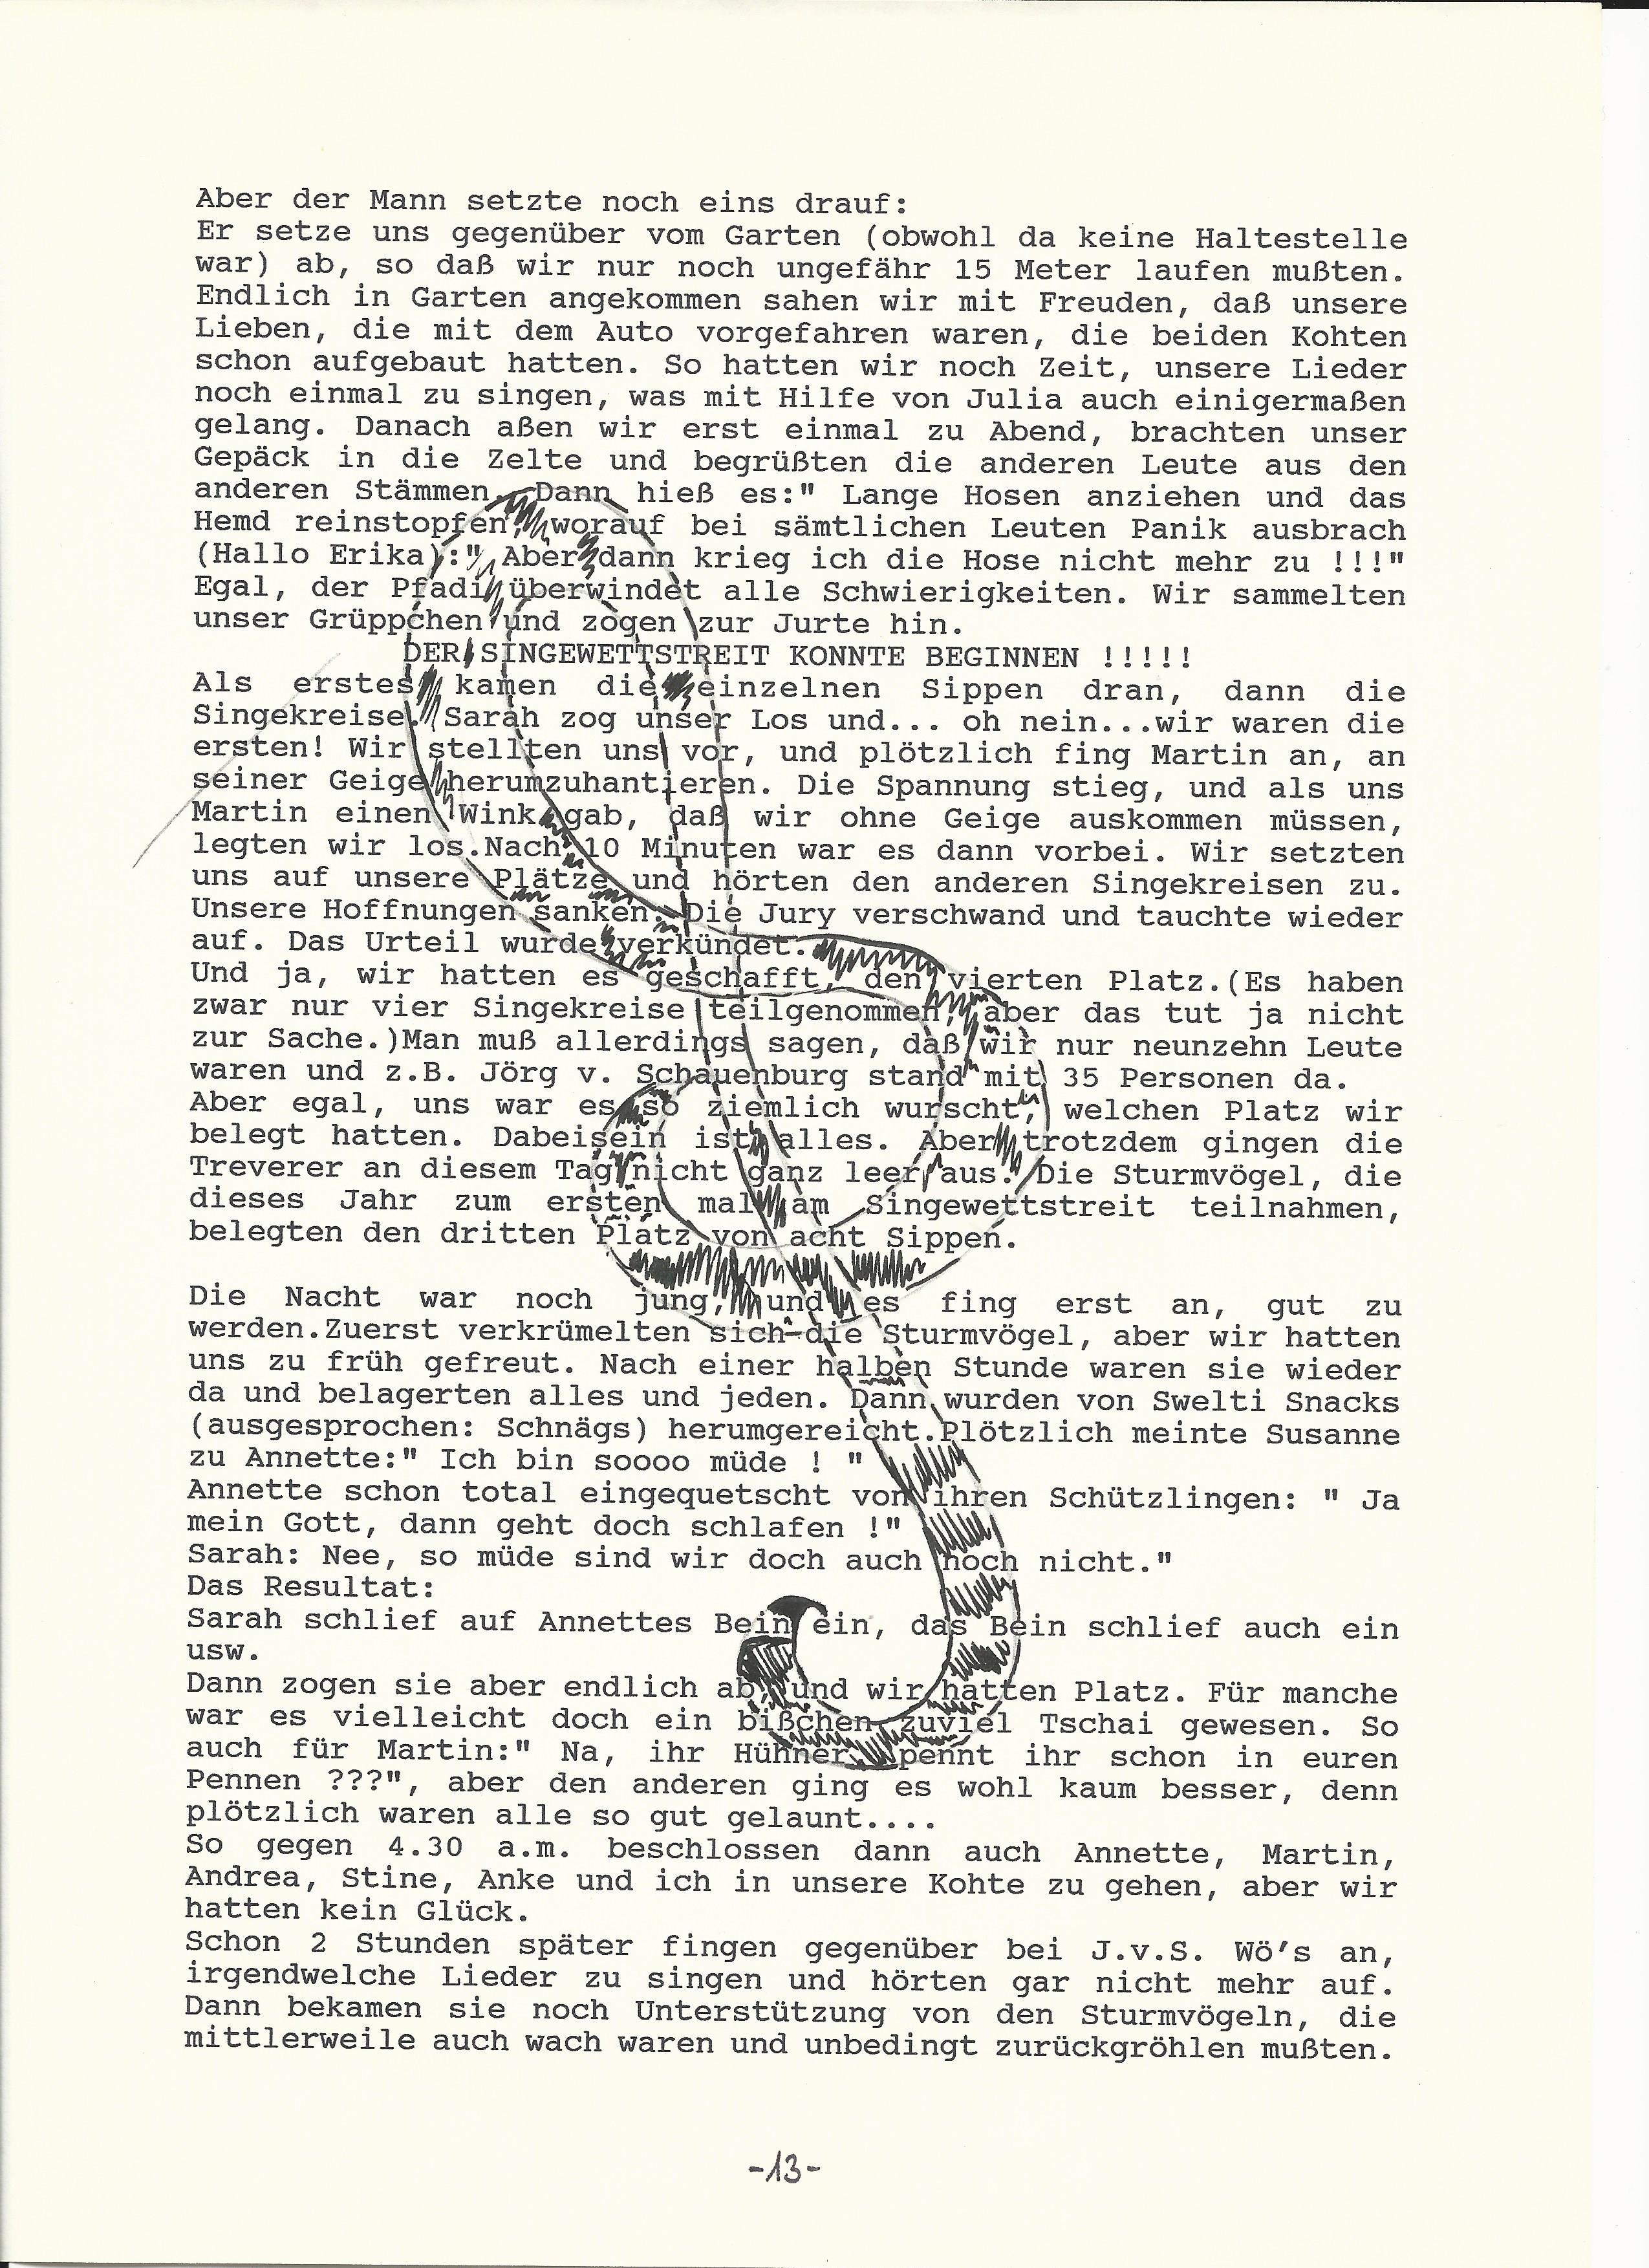 1994 - Singewettstreit0003